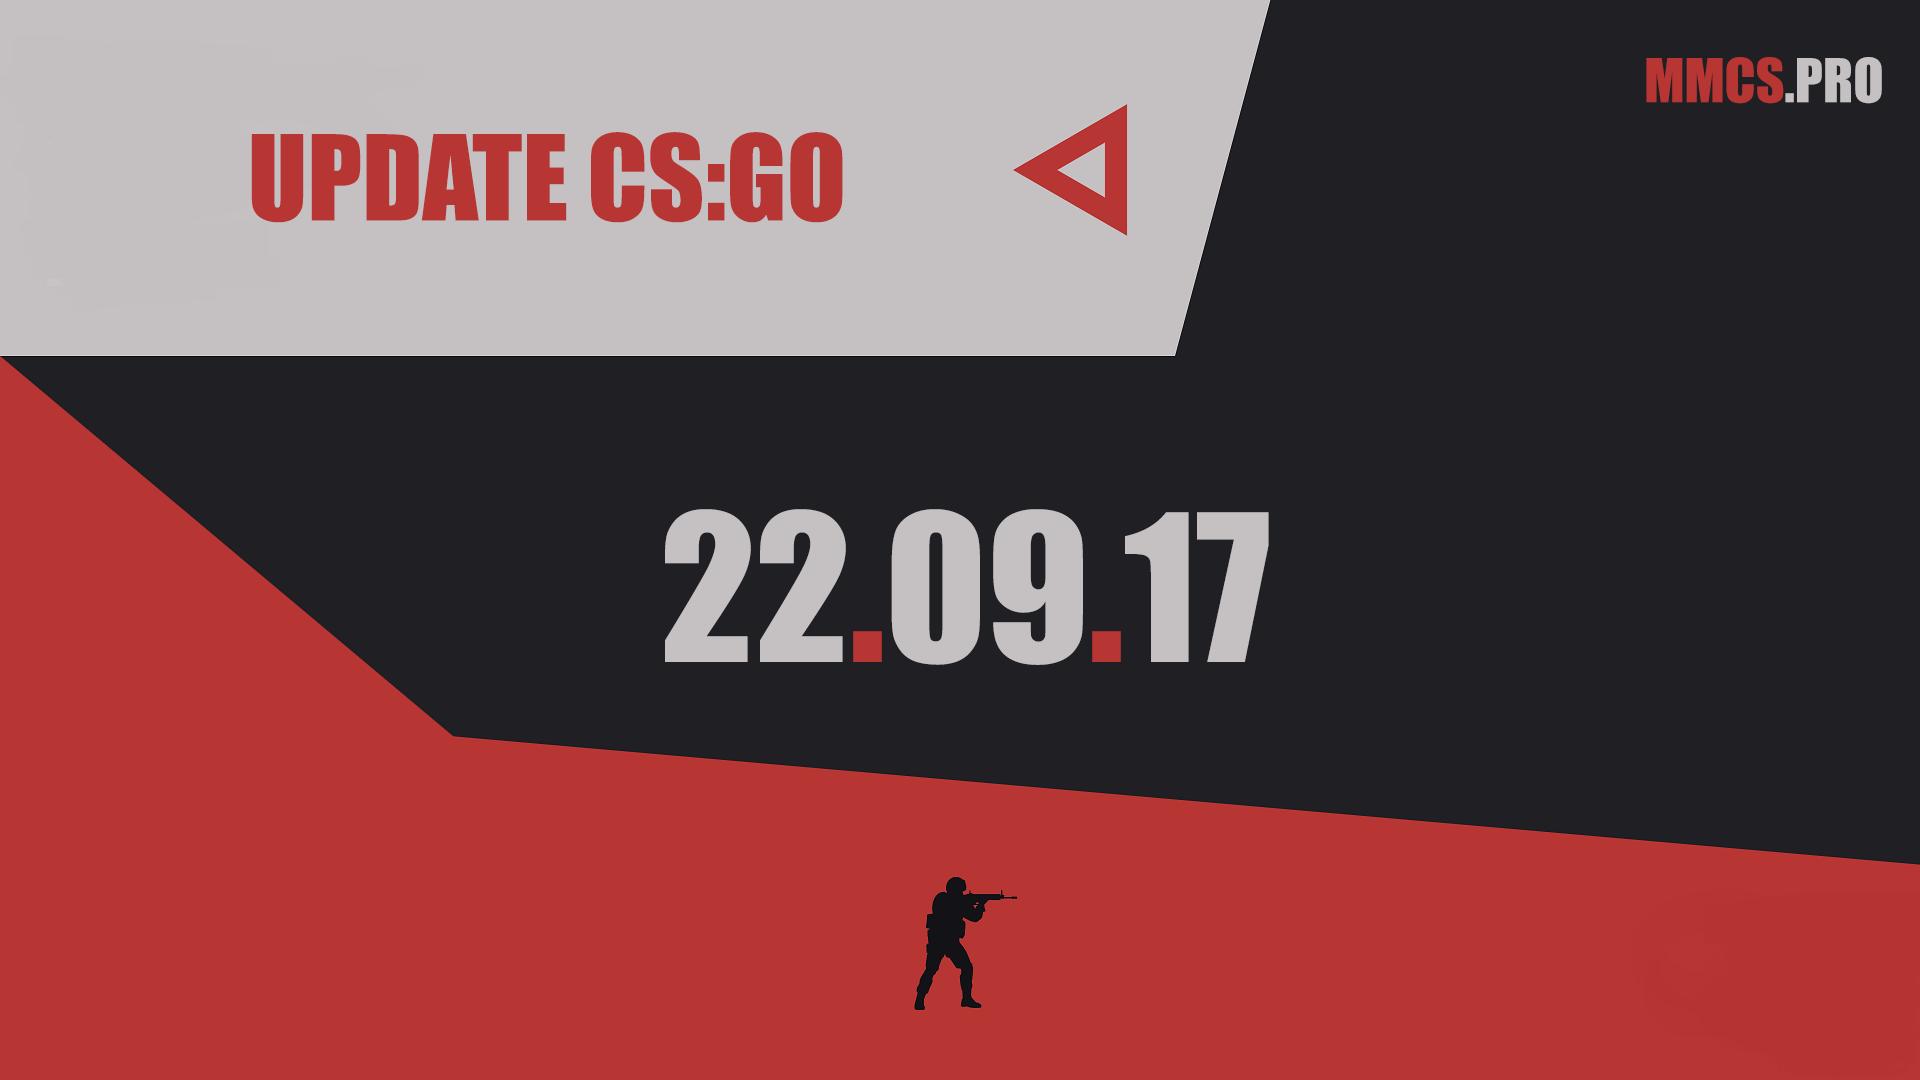 https://mmcs.pro/update-csgo-22-09-2017-valve/